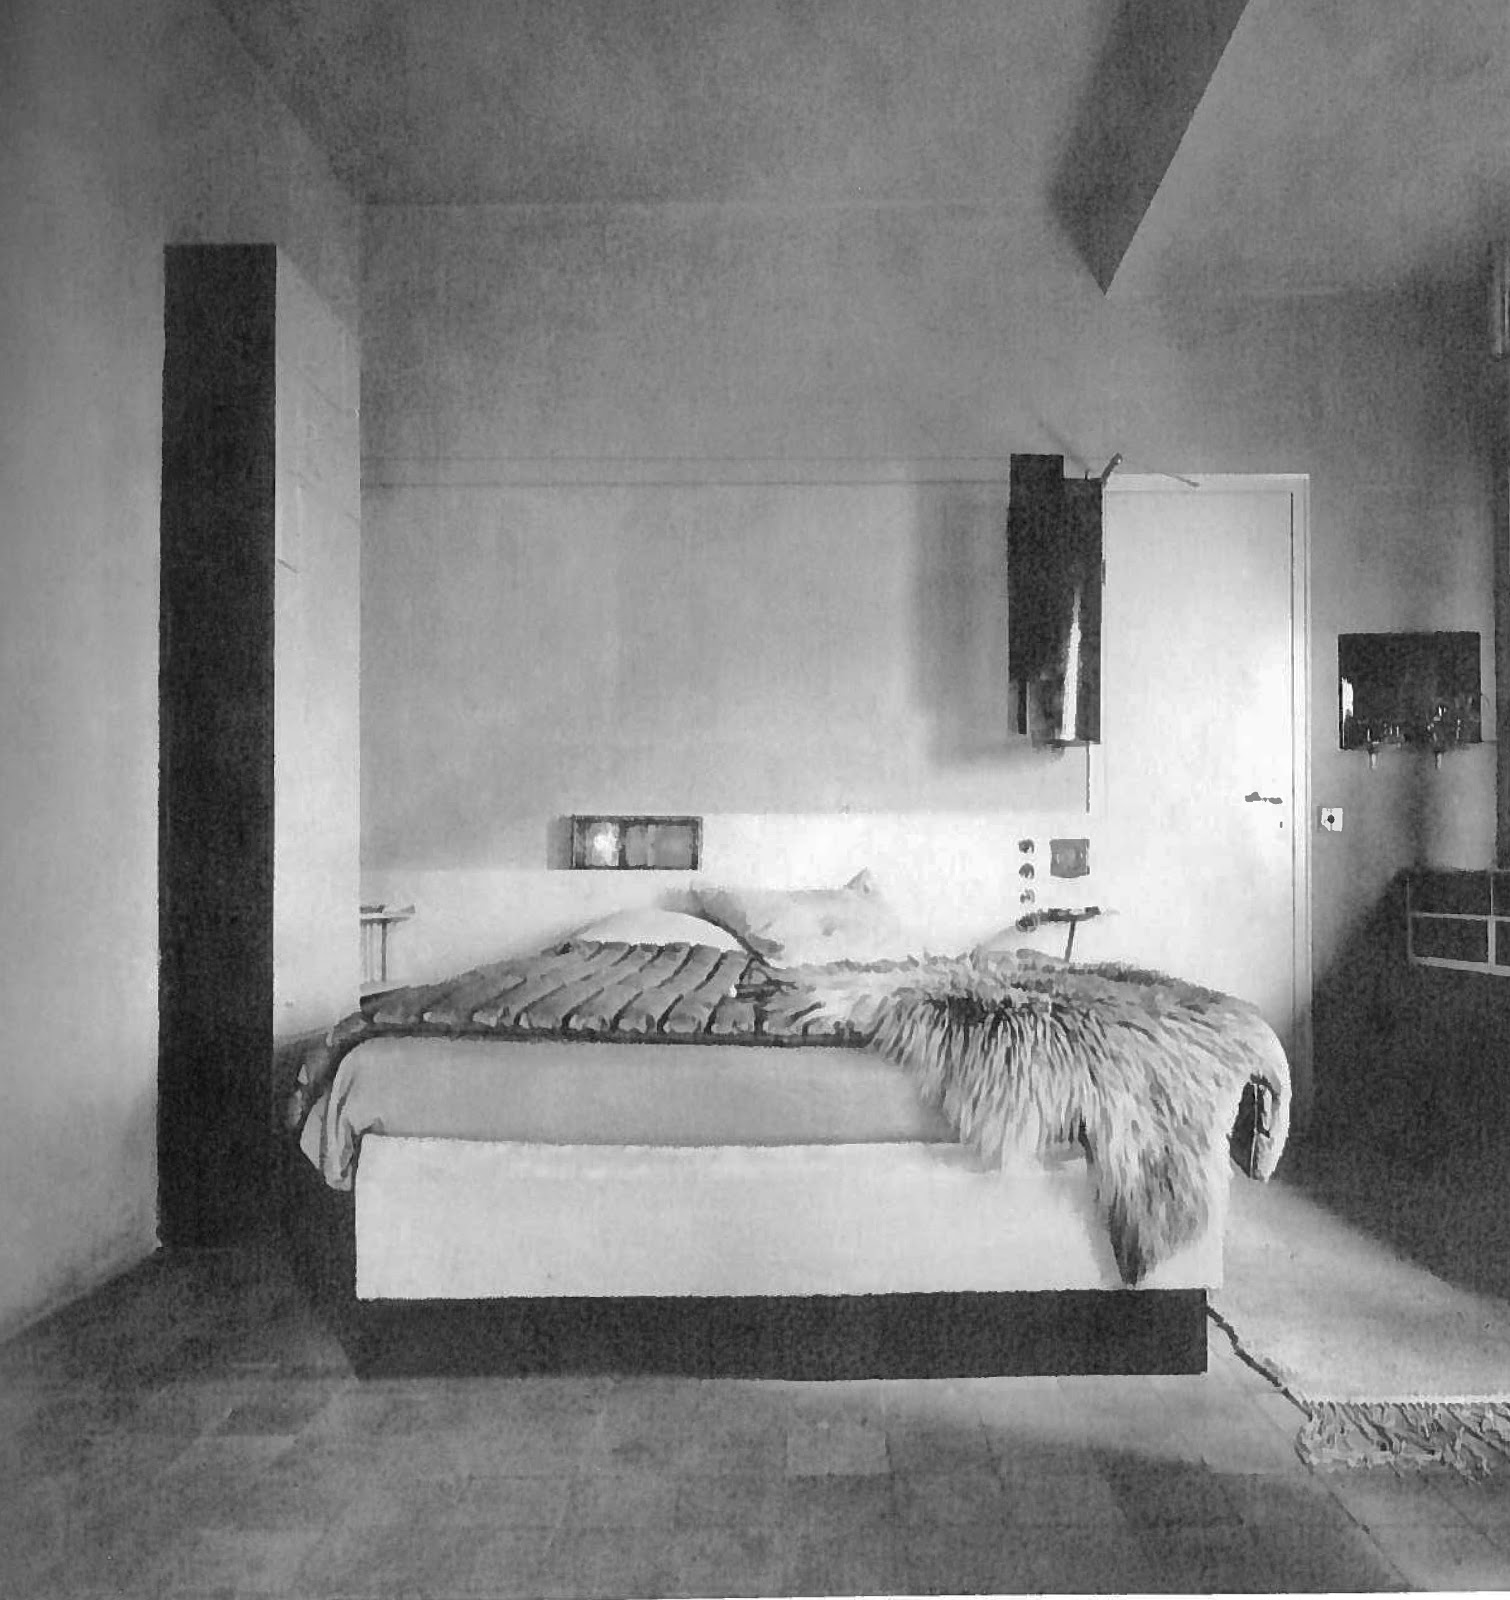 Thefurniture Com: E.1027: Furniture Makes The Room